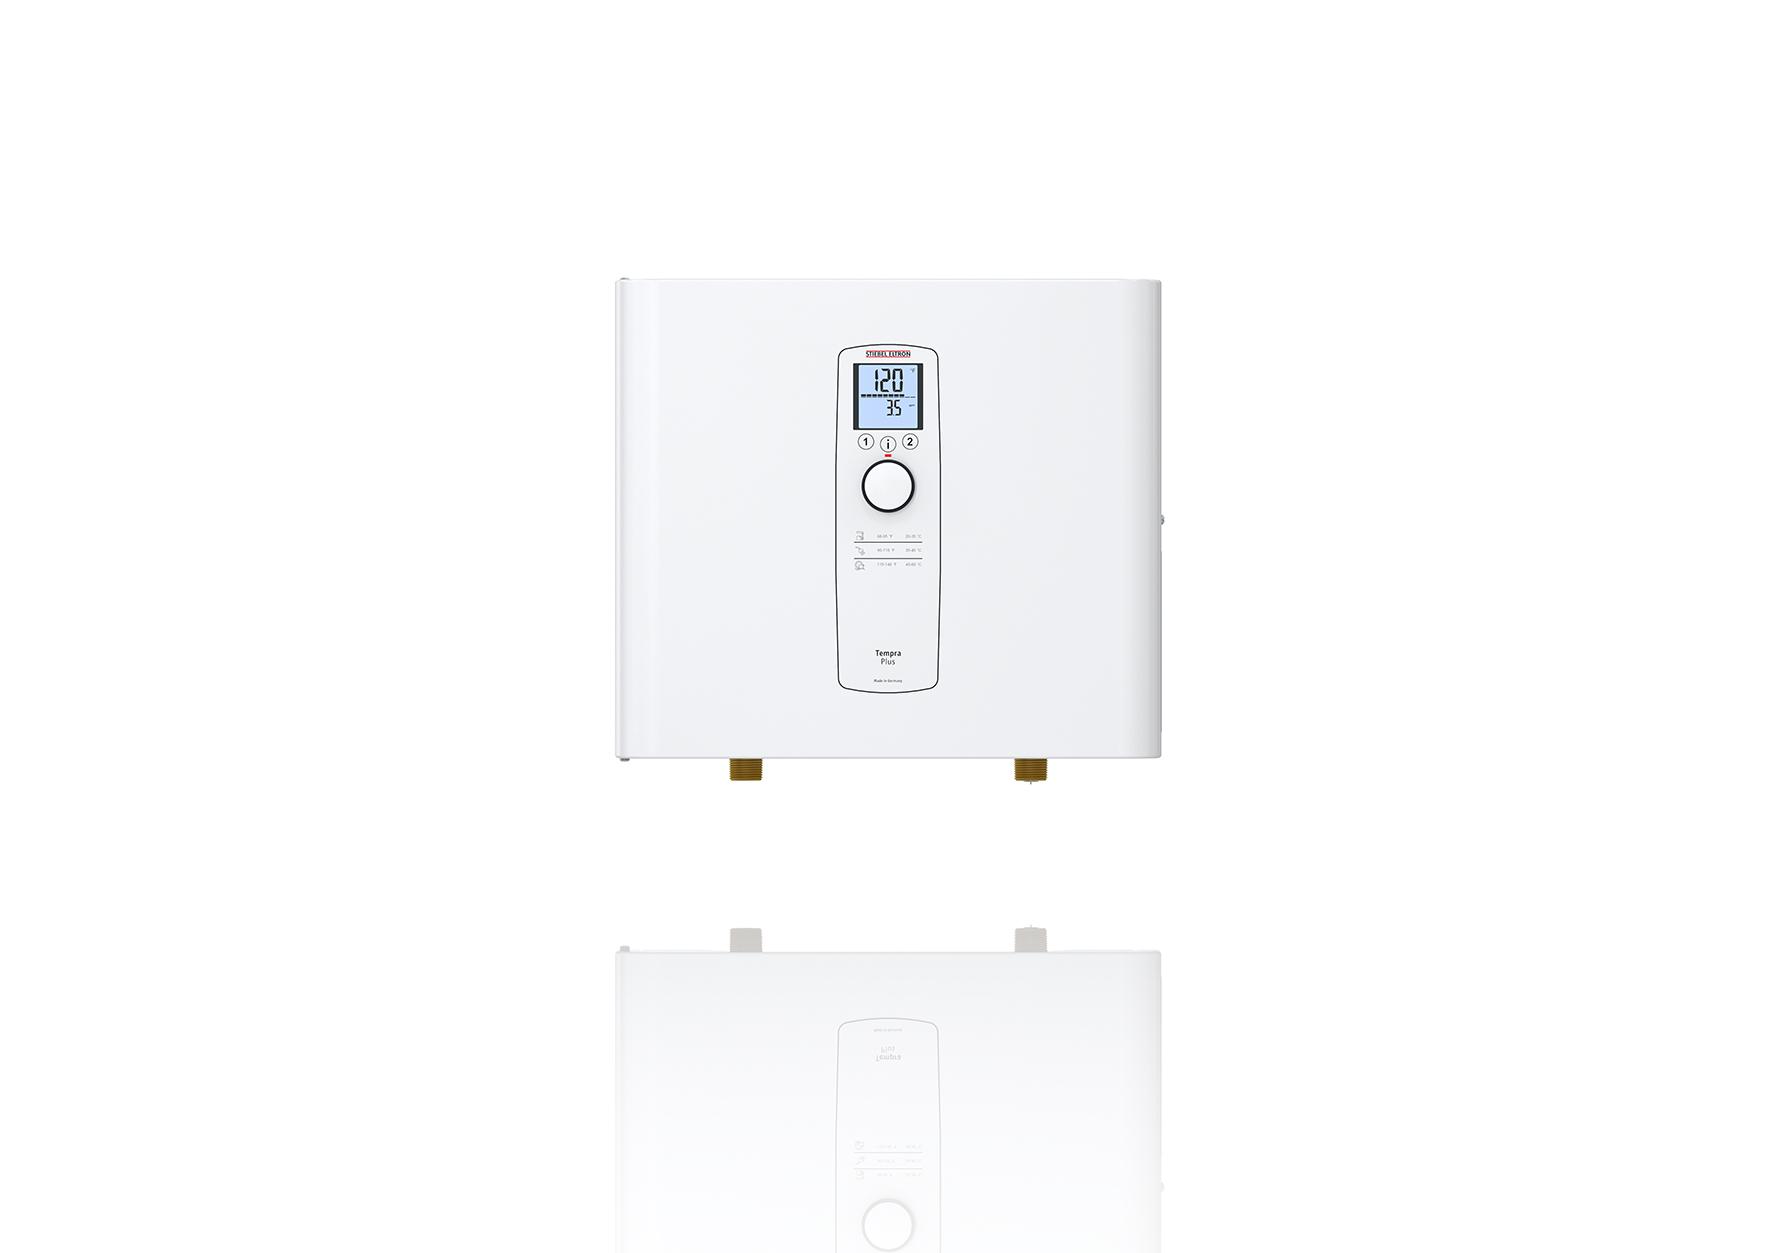 Tempra Plus Instantaneous Water Heater From Stiebel Eltron Stiebel Eltron Press Release